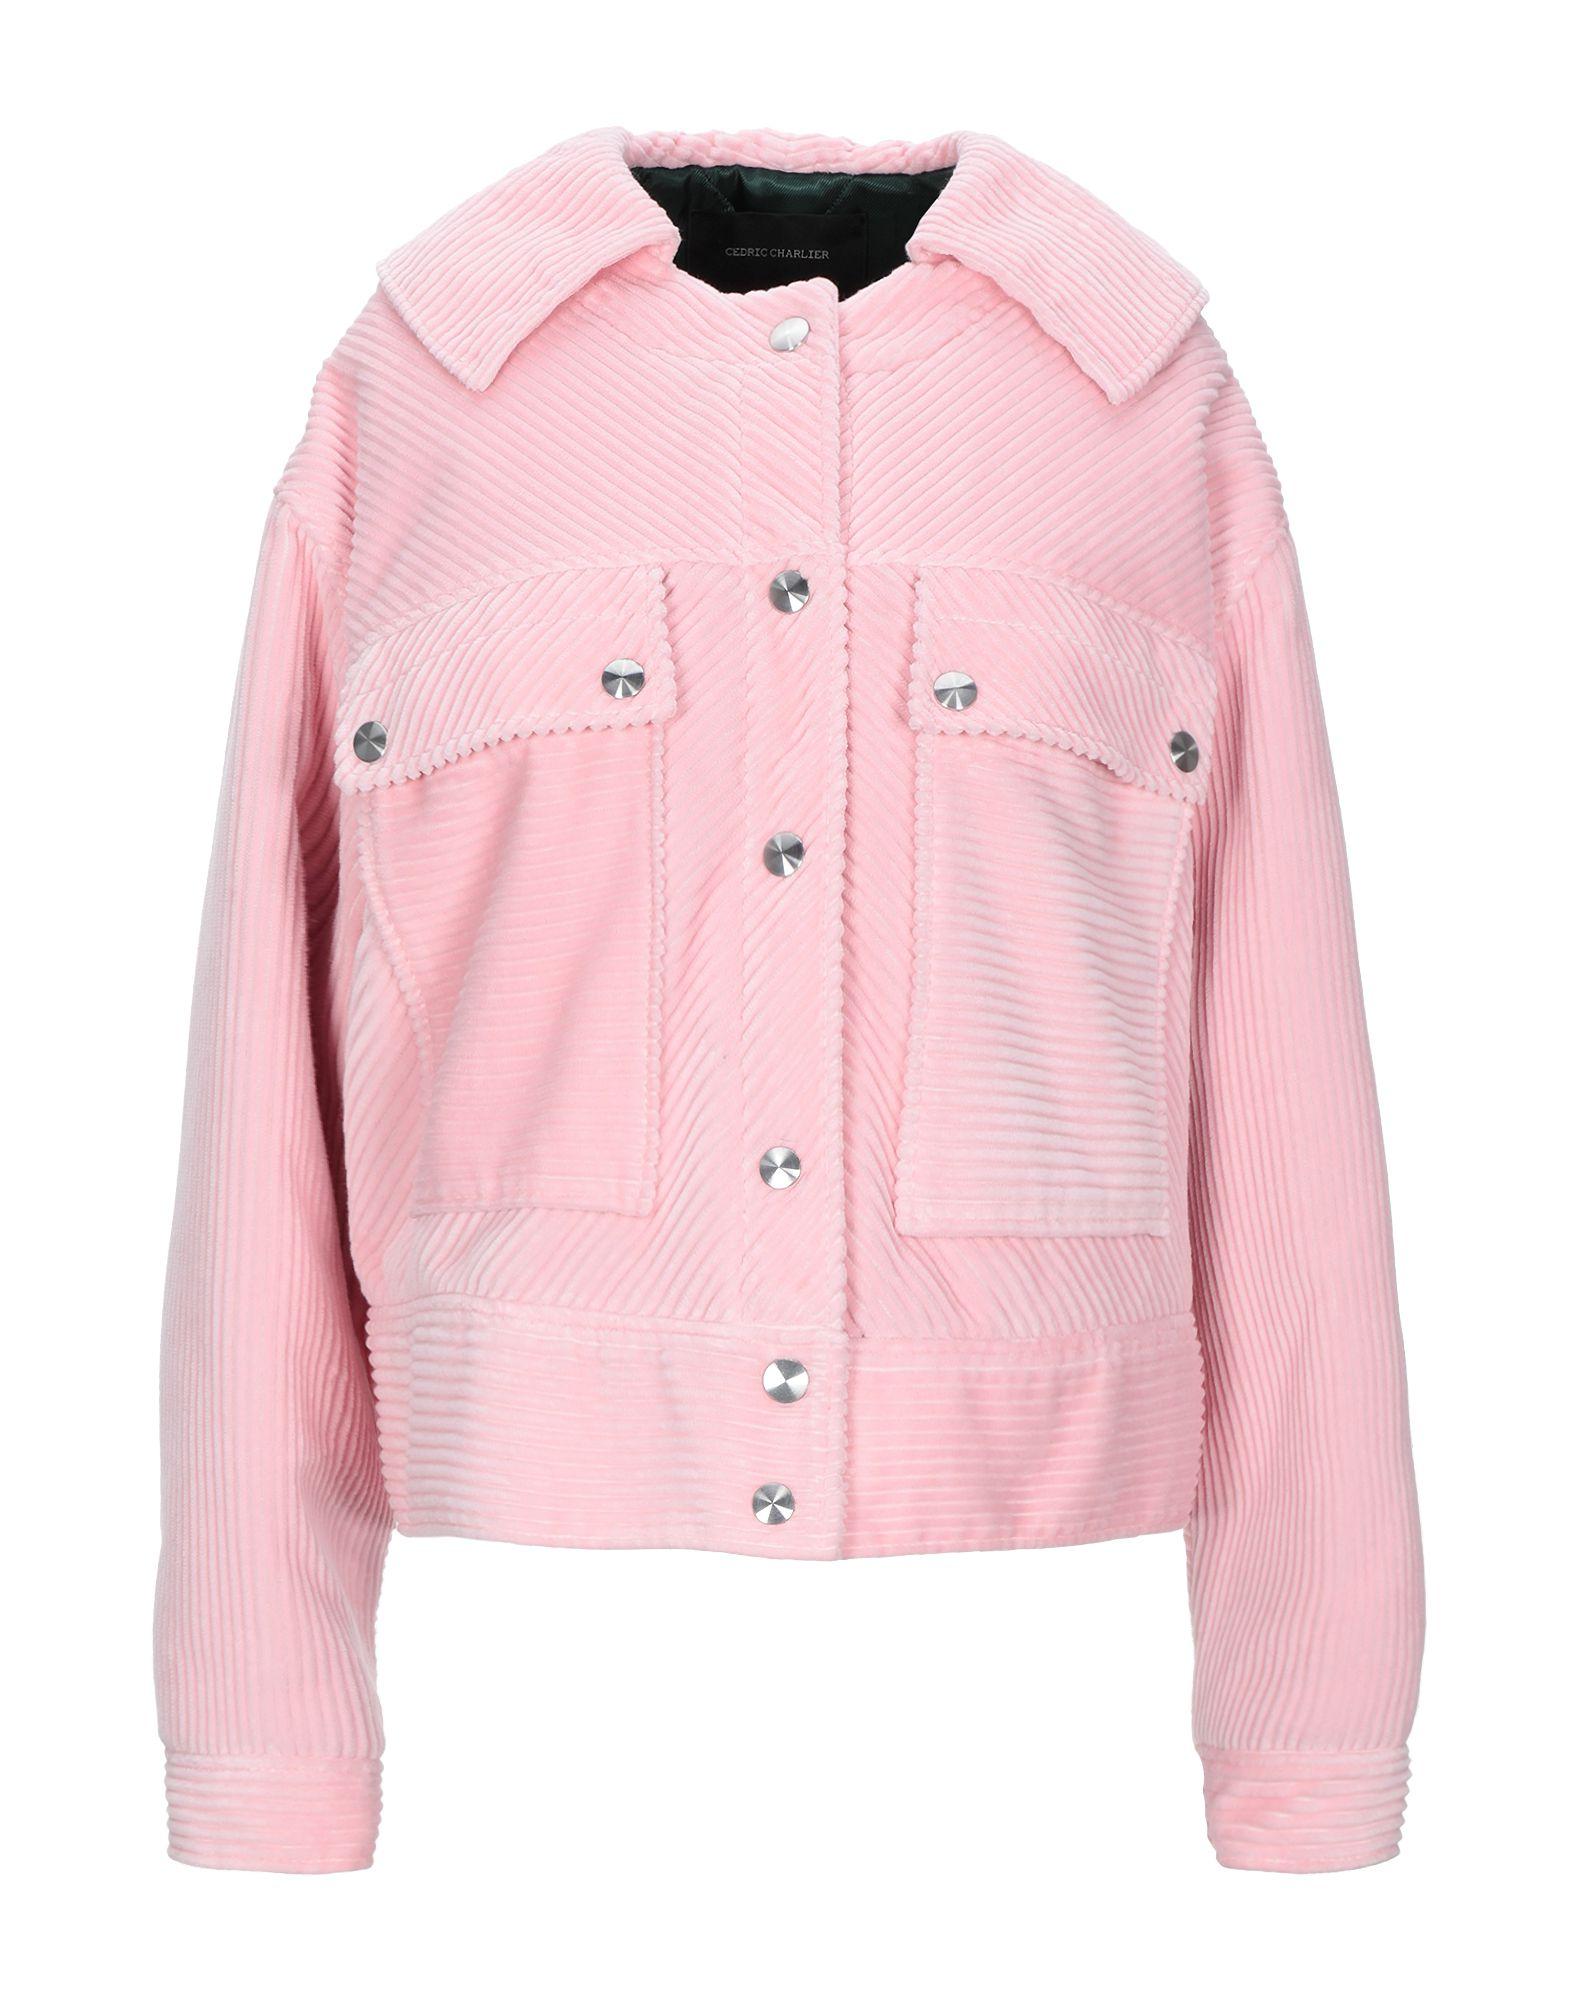 CEDRIC CHARLIER Jackets - Item 41896040